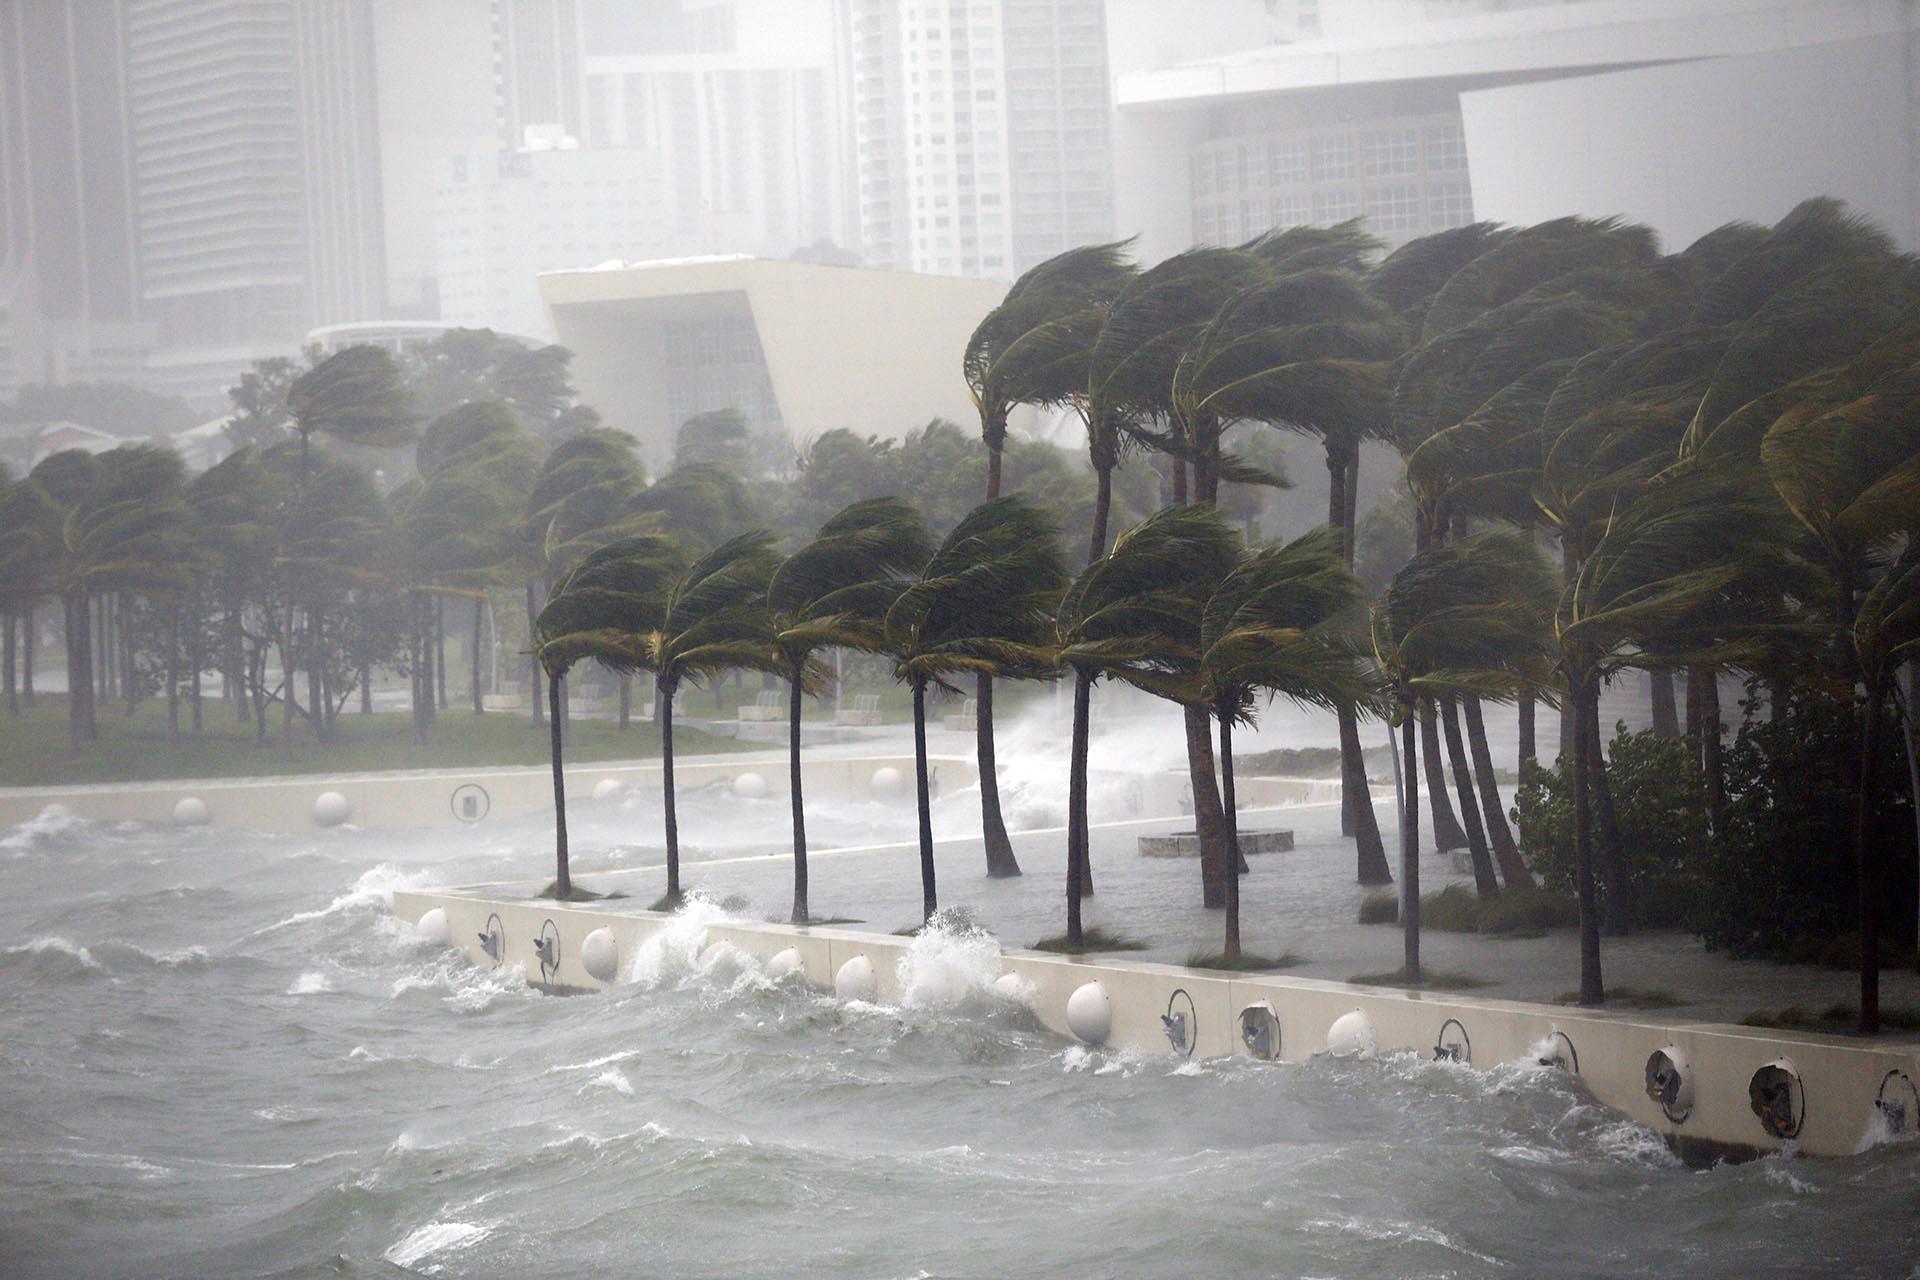 Resultado de imagen para huracan irma miami